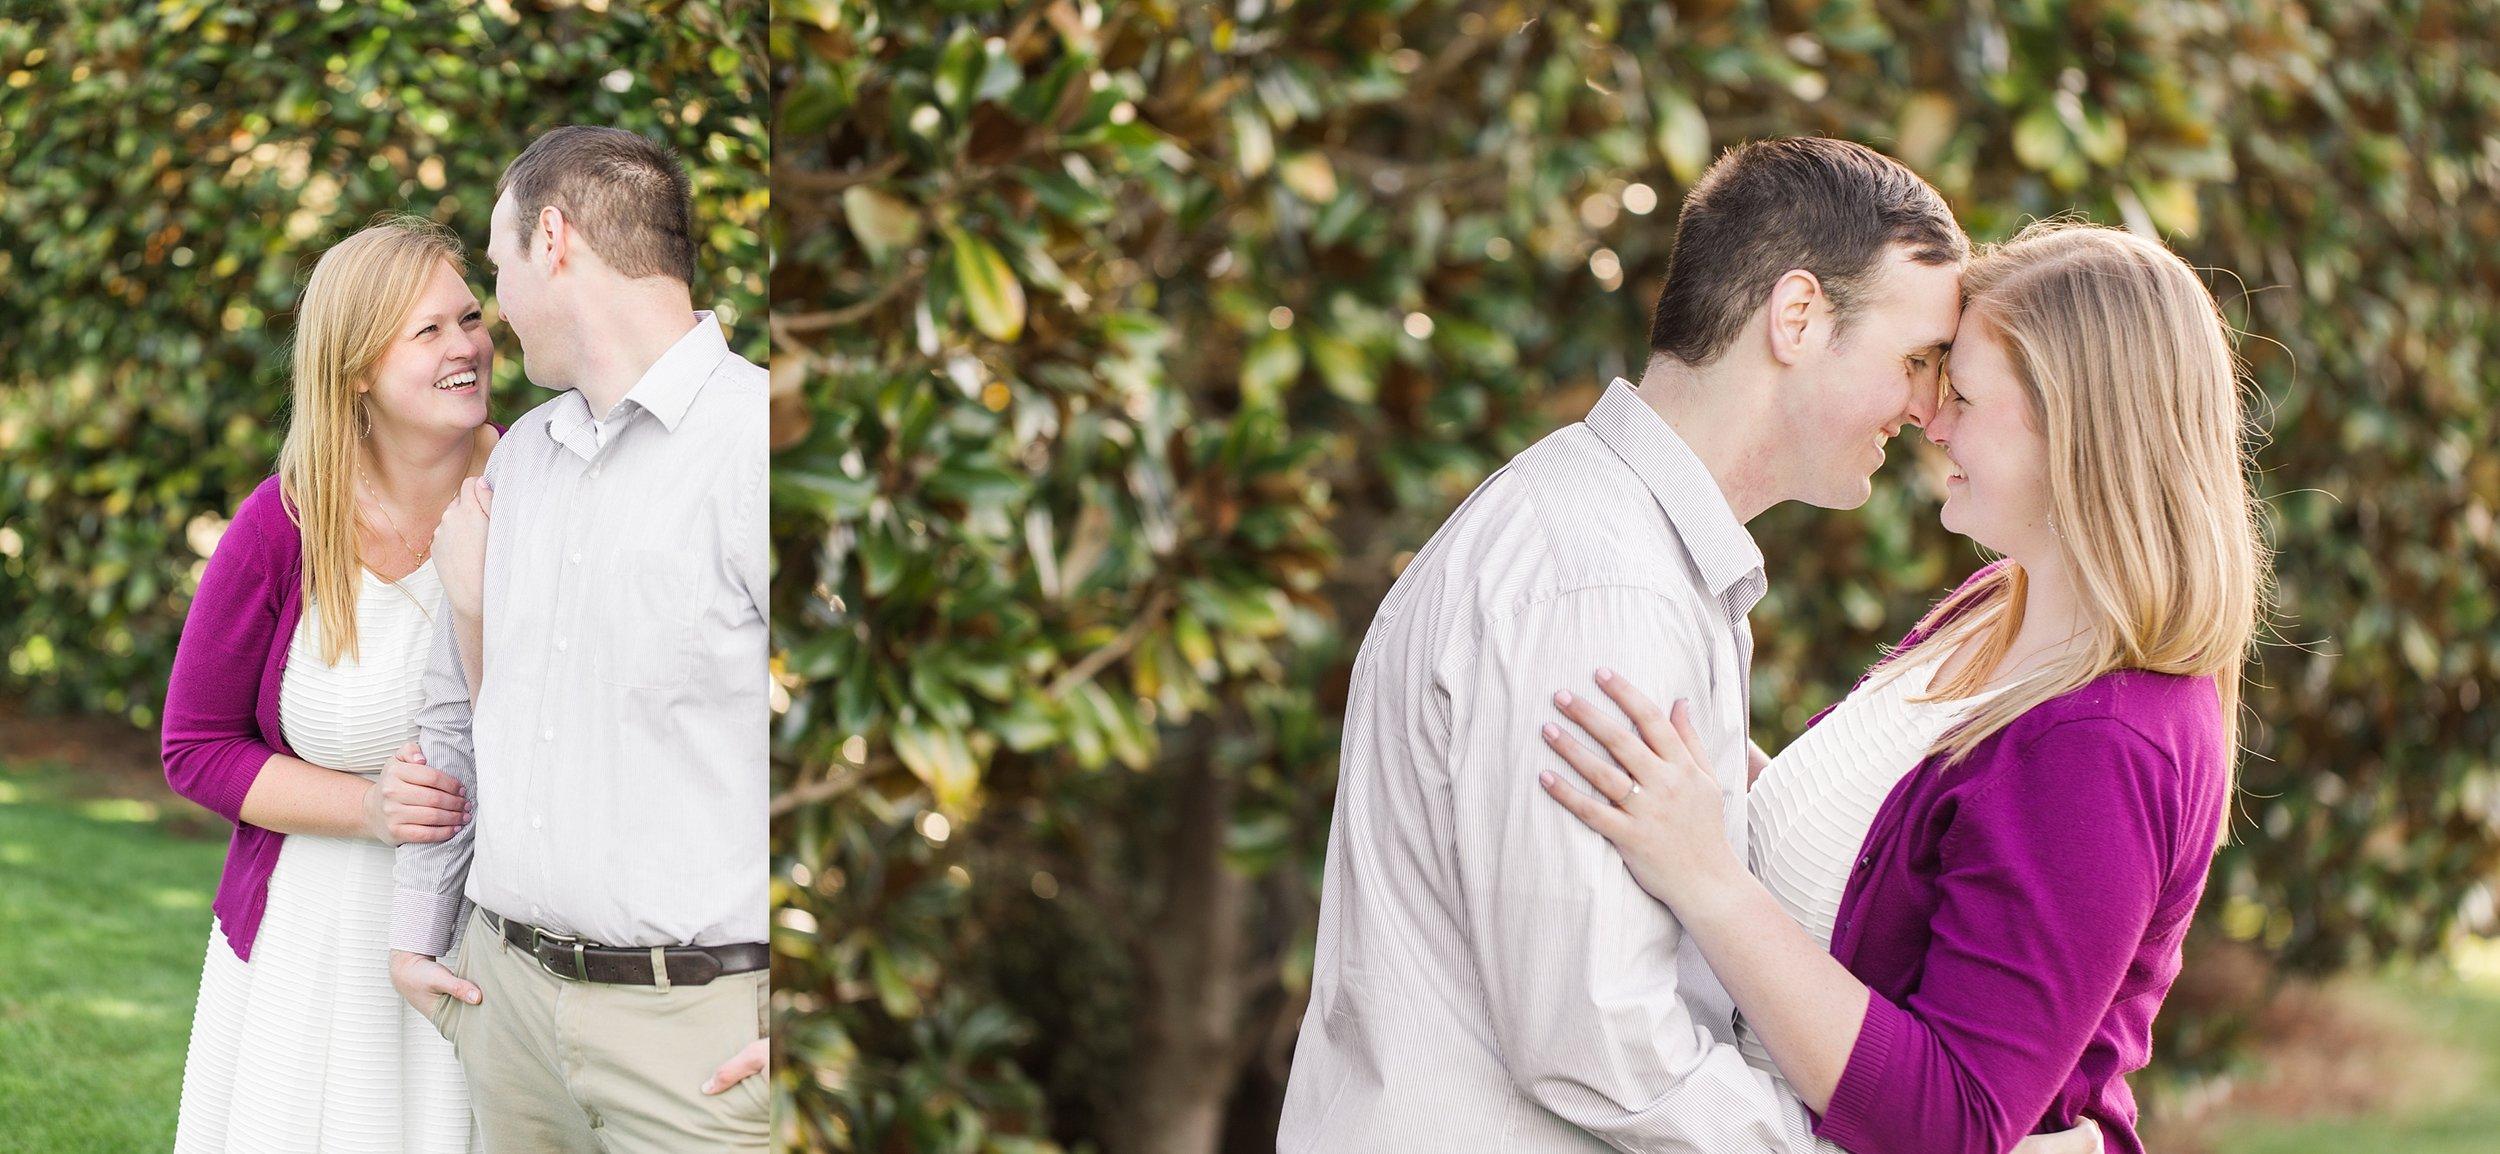 Oklahoma-City-Engagement-Photographer-KomorebiPhotography